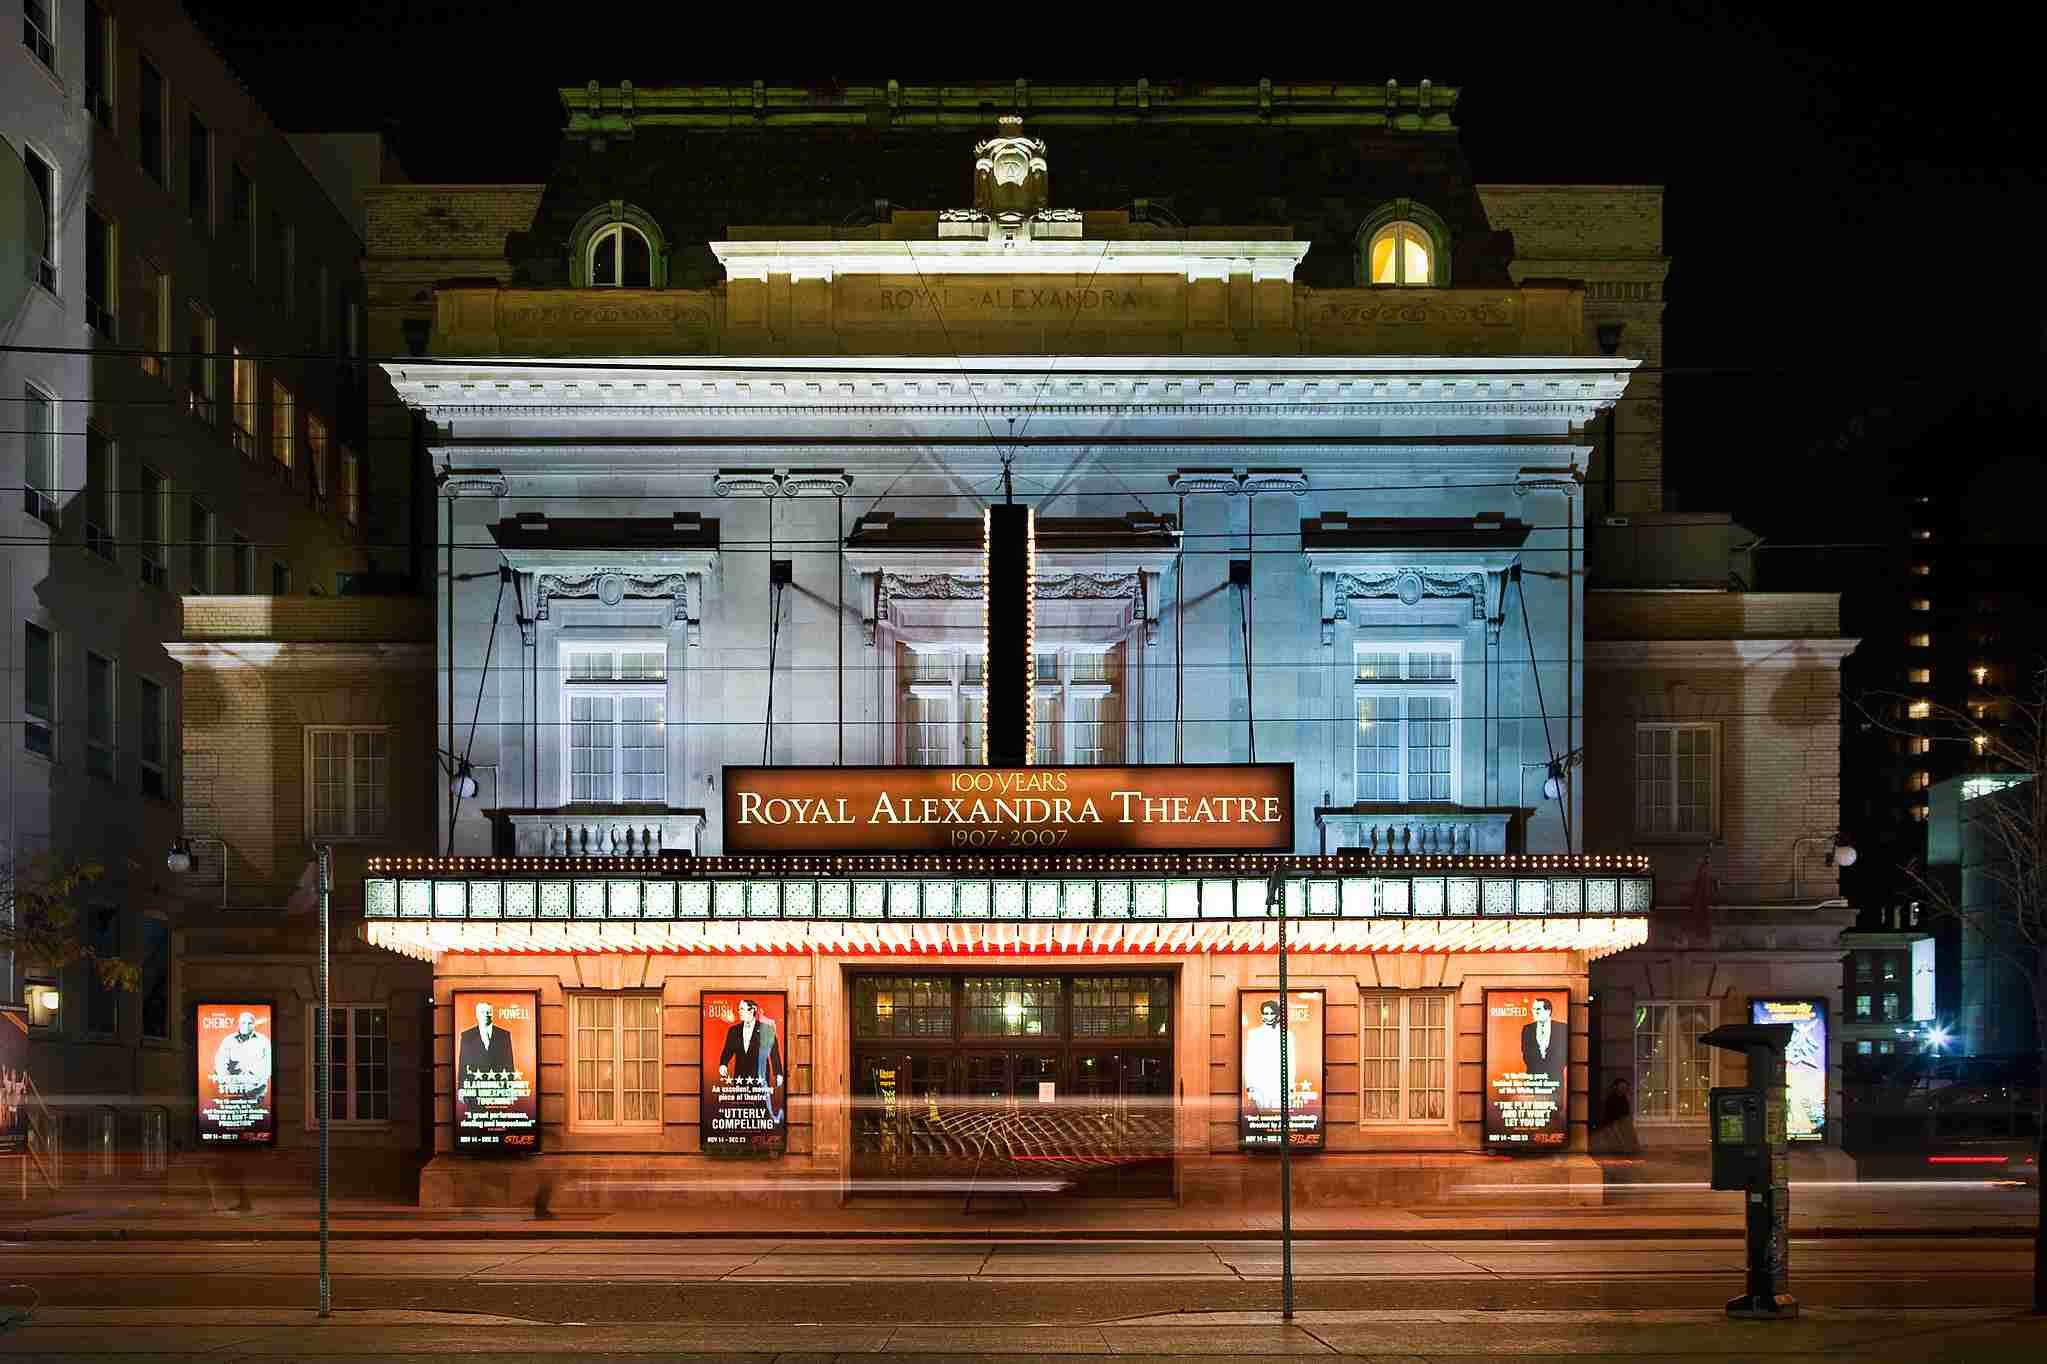 Royal Alexandria Theatre